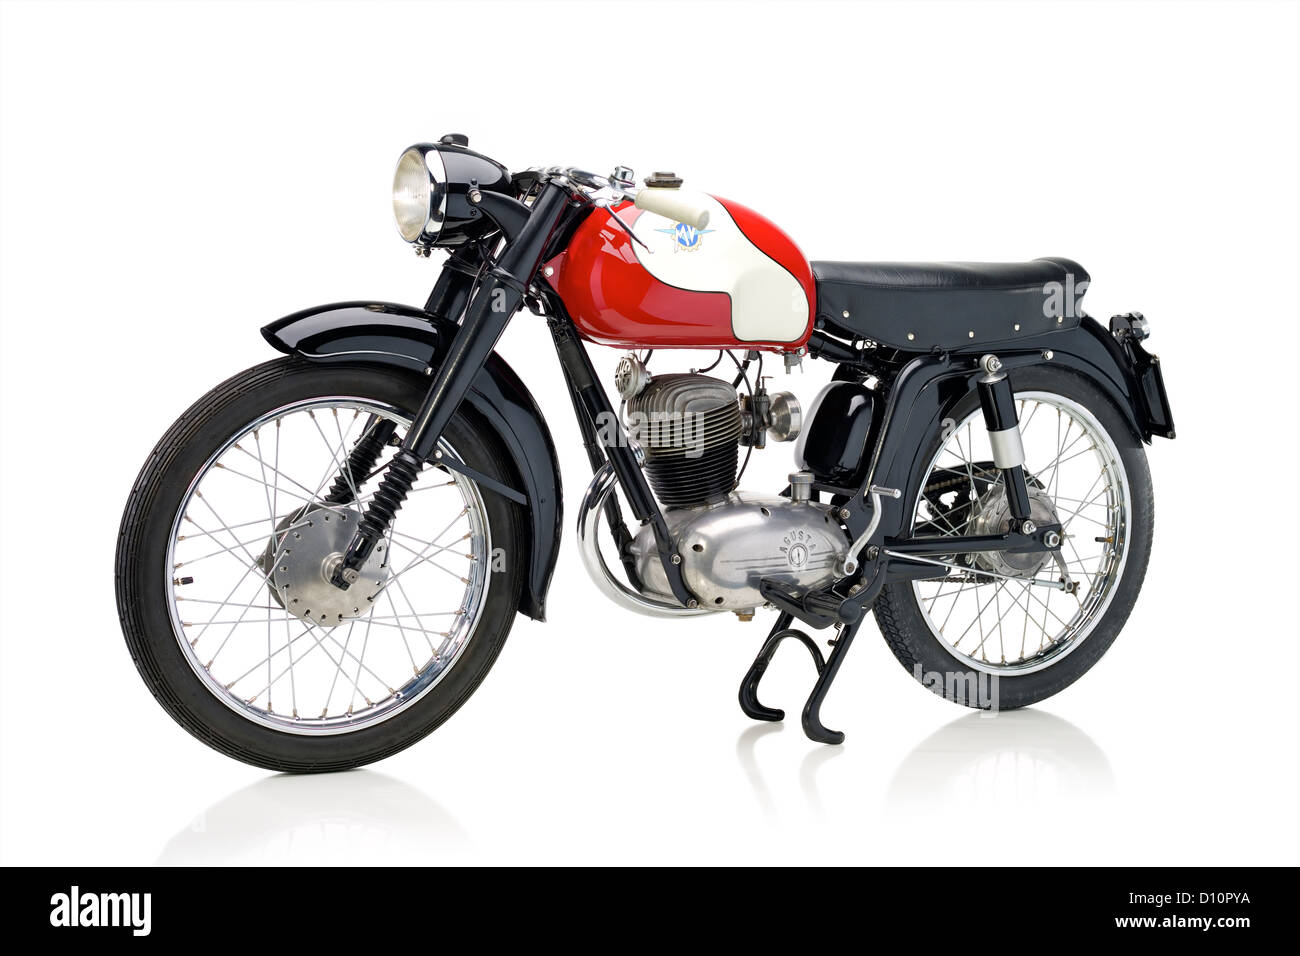 1956 MV Agusta 125 TRA motorcycle - Stock Image